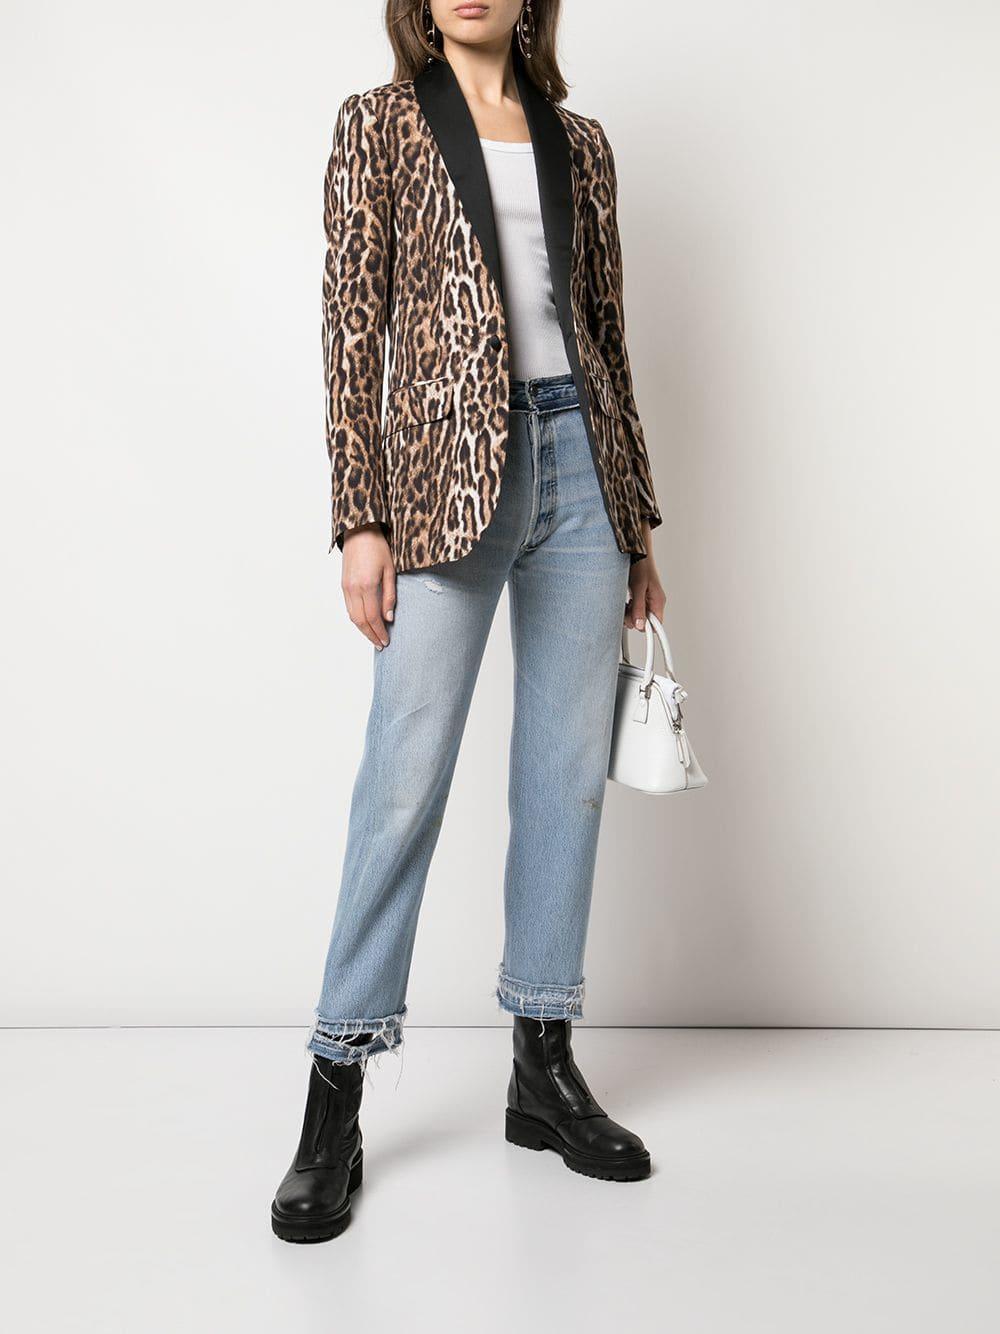 8d6127a51ca9 R13 Leopard Print Blazer in Brown - Lyst